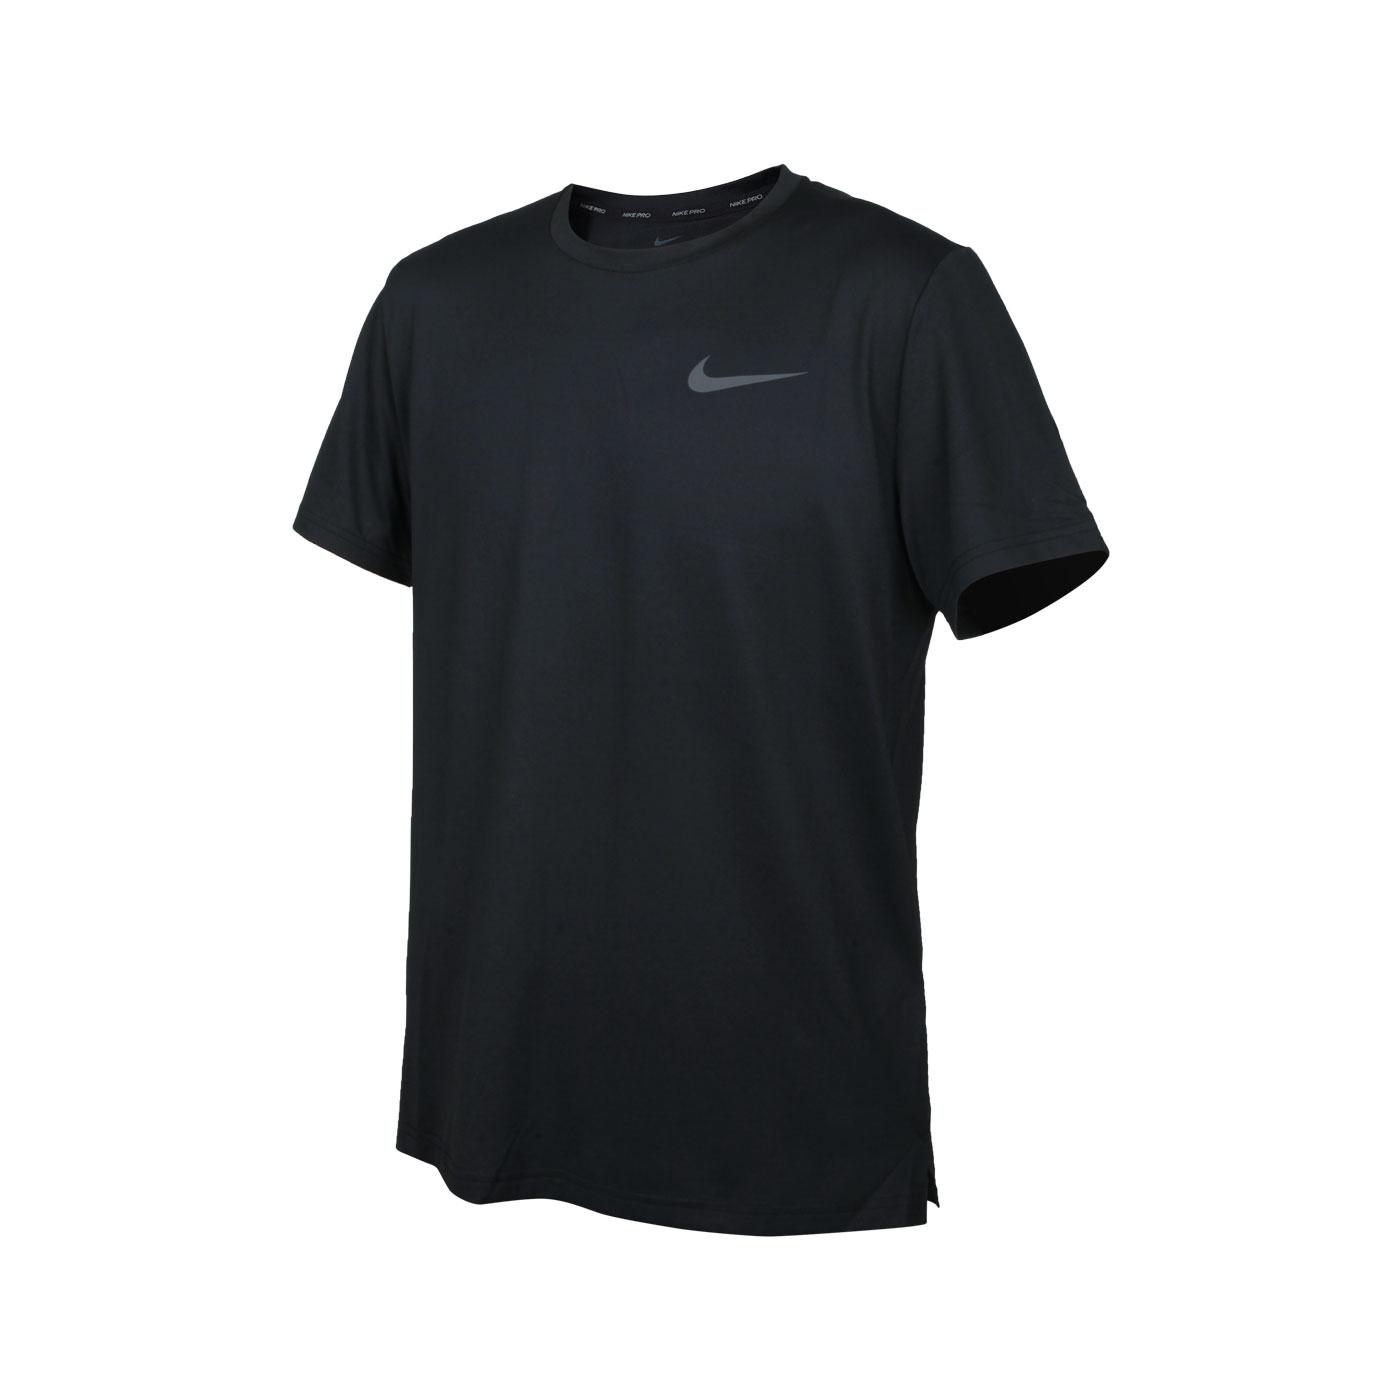 NIKE 男款短袖T恤 CZ1182-011 - 黑灰